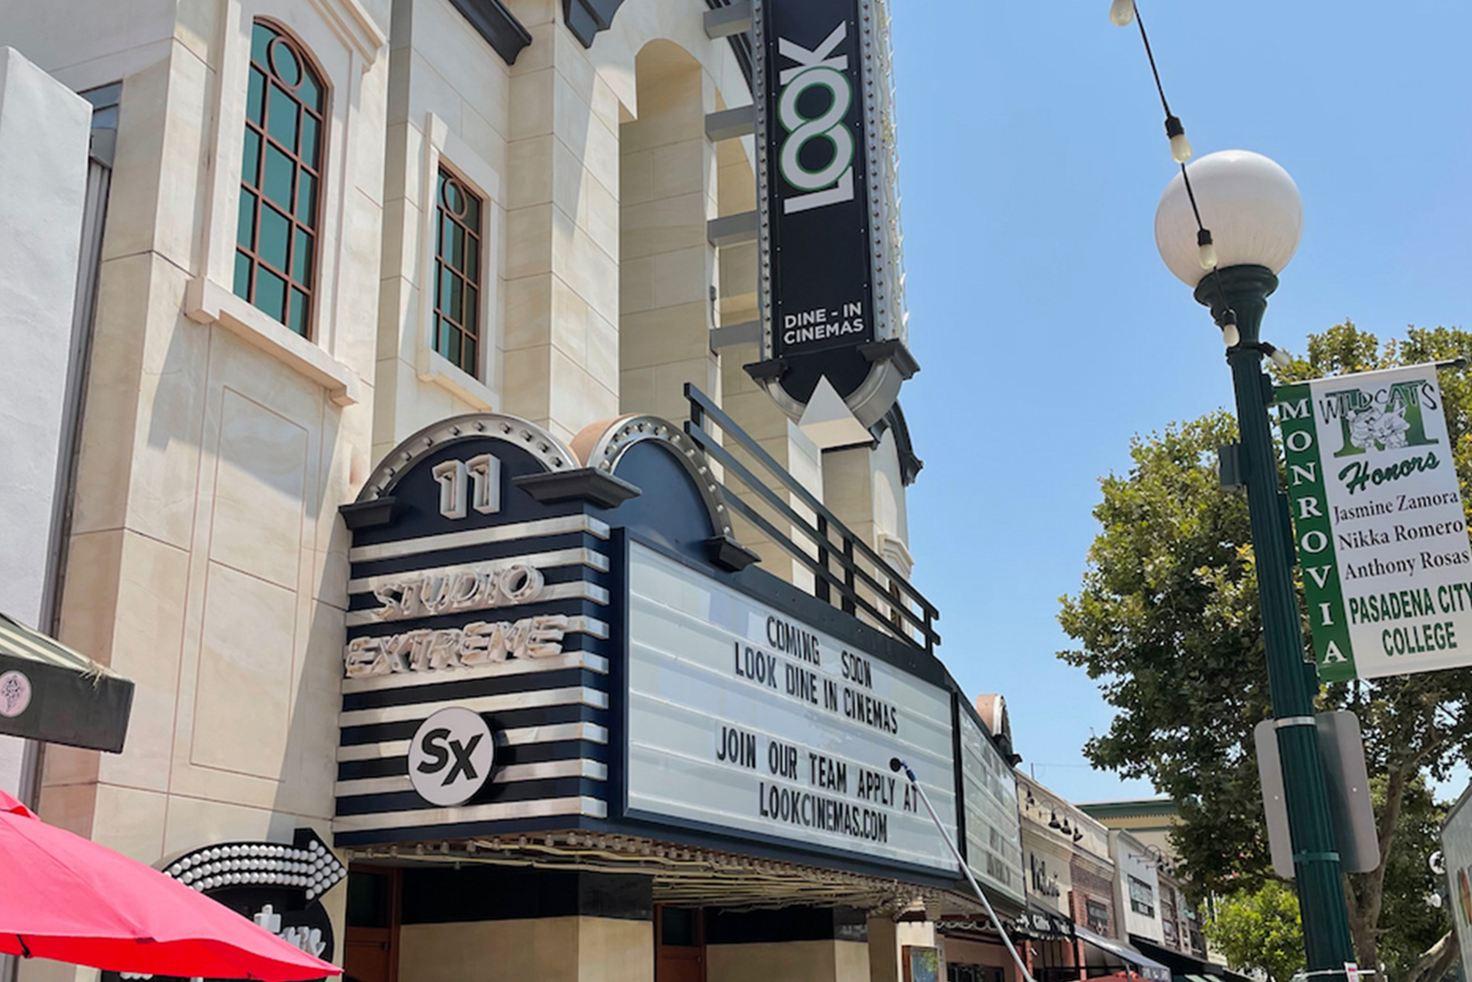 Monrovia, CA - LOOK Dine-in Cinema